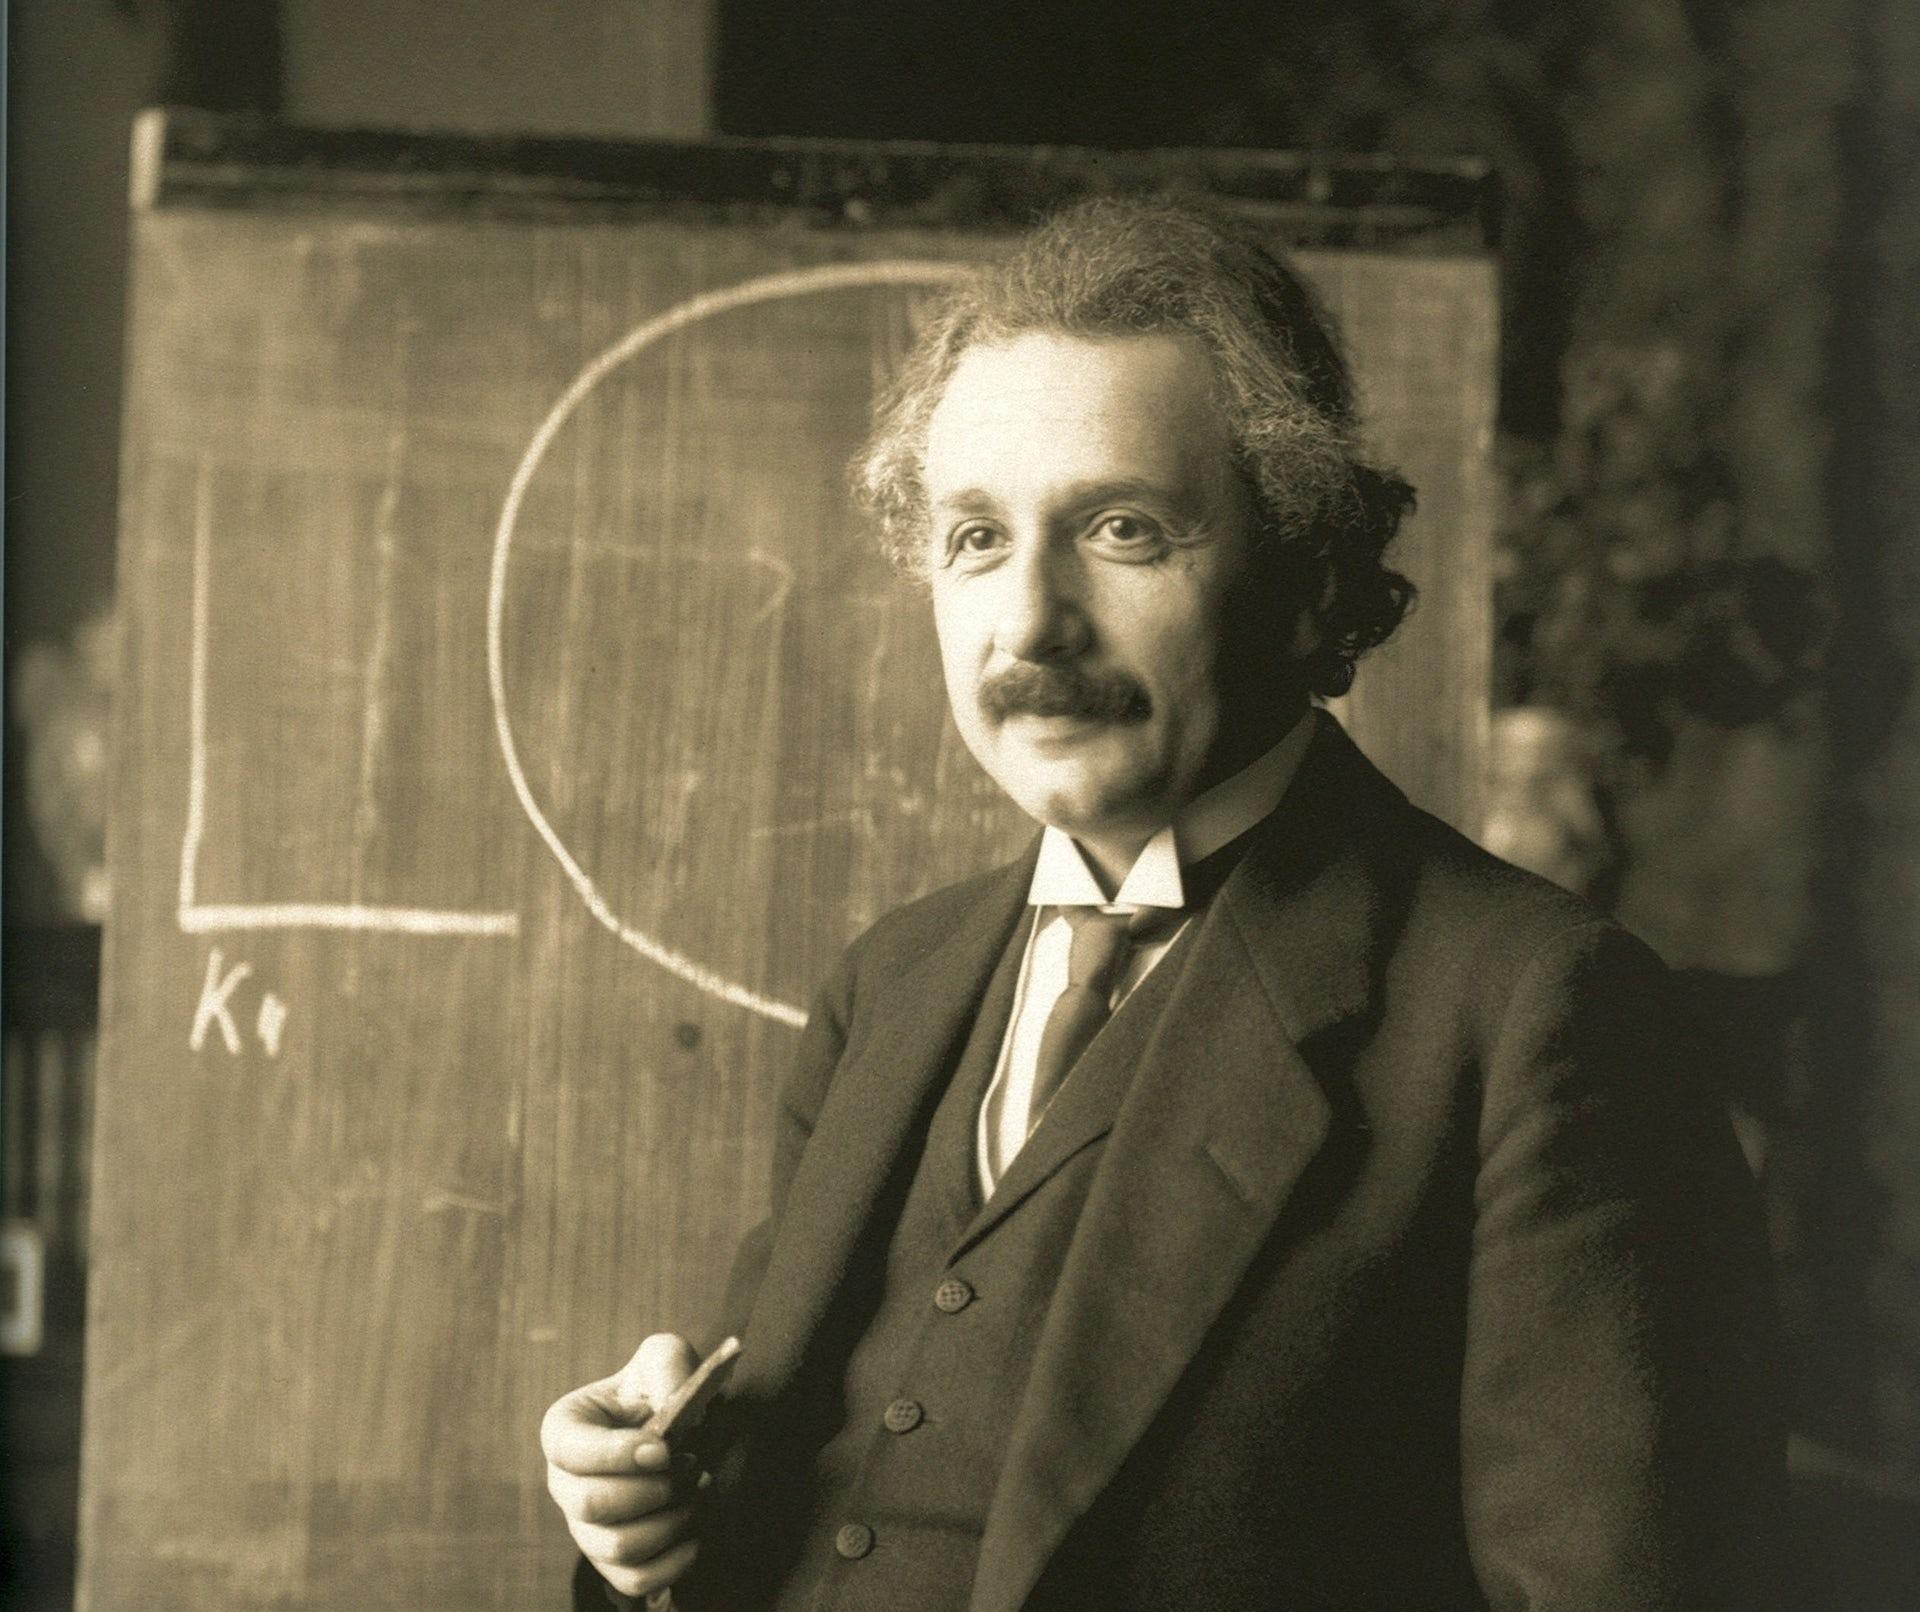 Without Einstein it would have taken decades longer to understand gravity